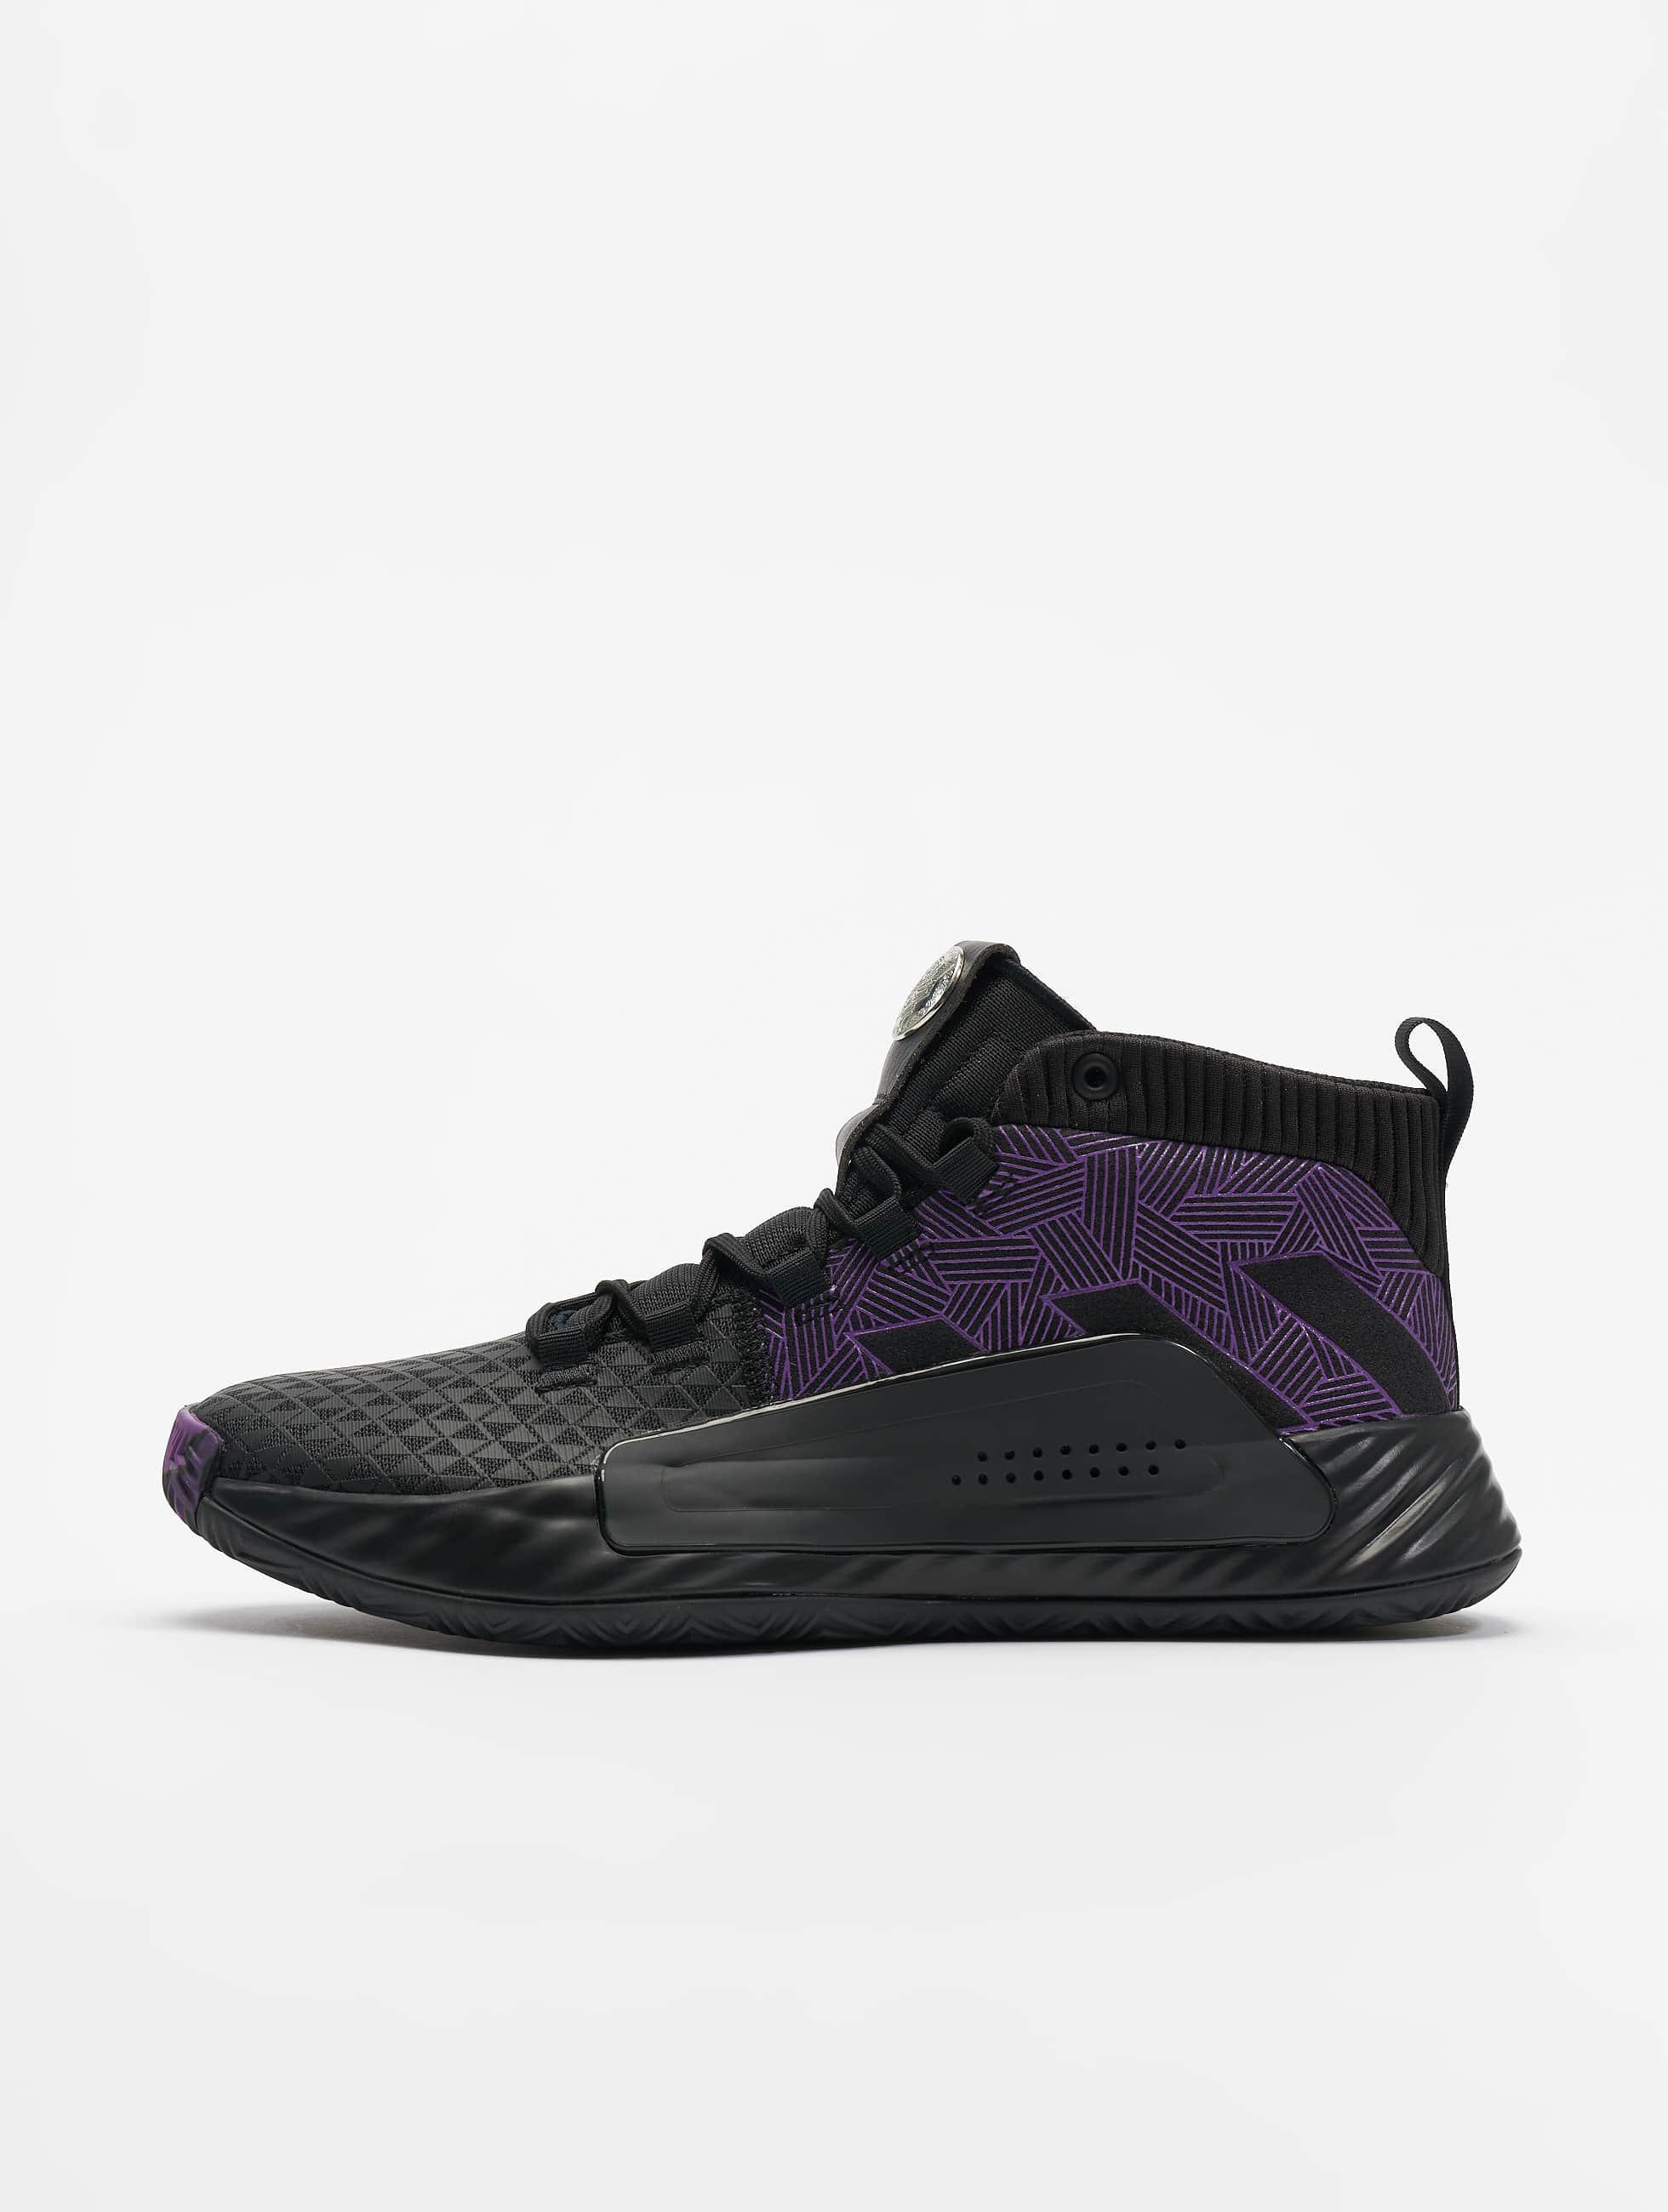 Adidas Dame 5 J Basketball Shoes Core BlackActive PurpleSilvern Met